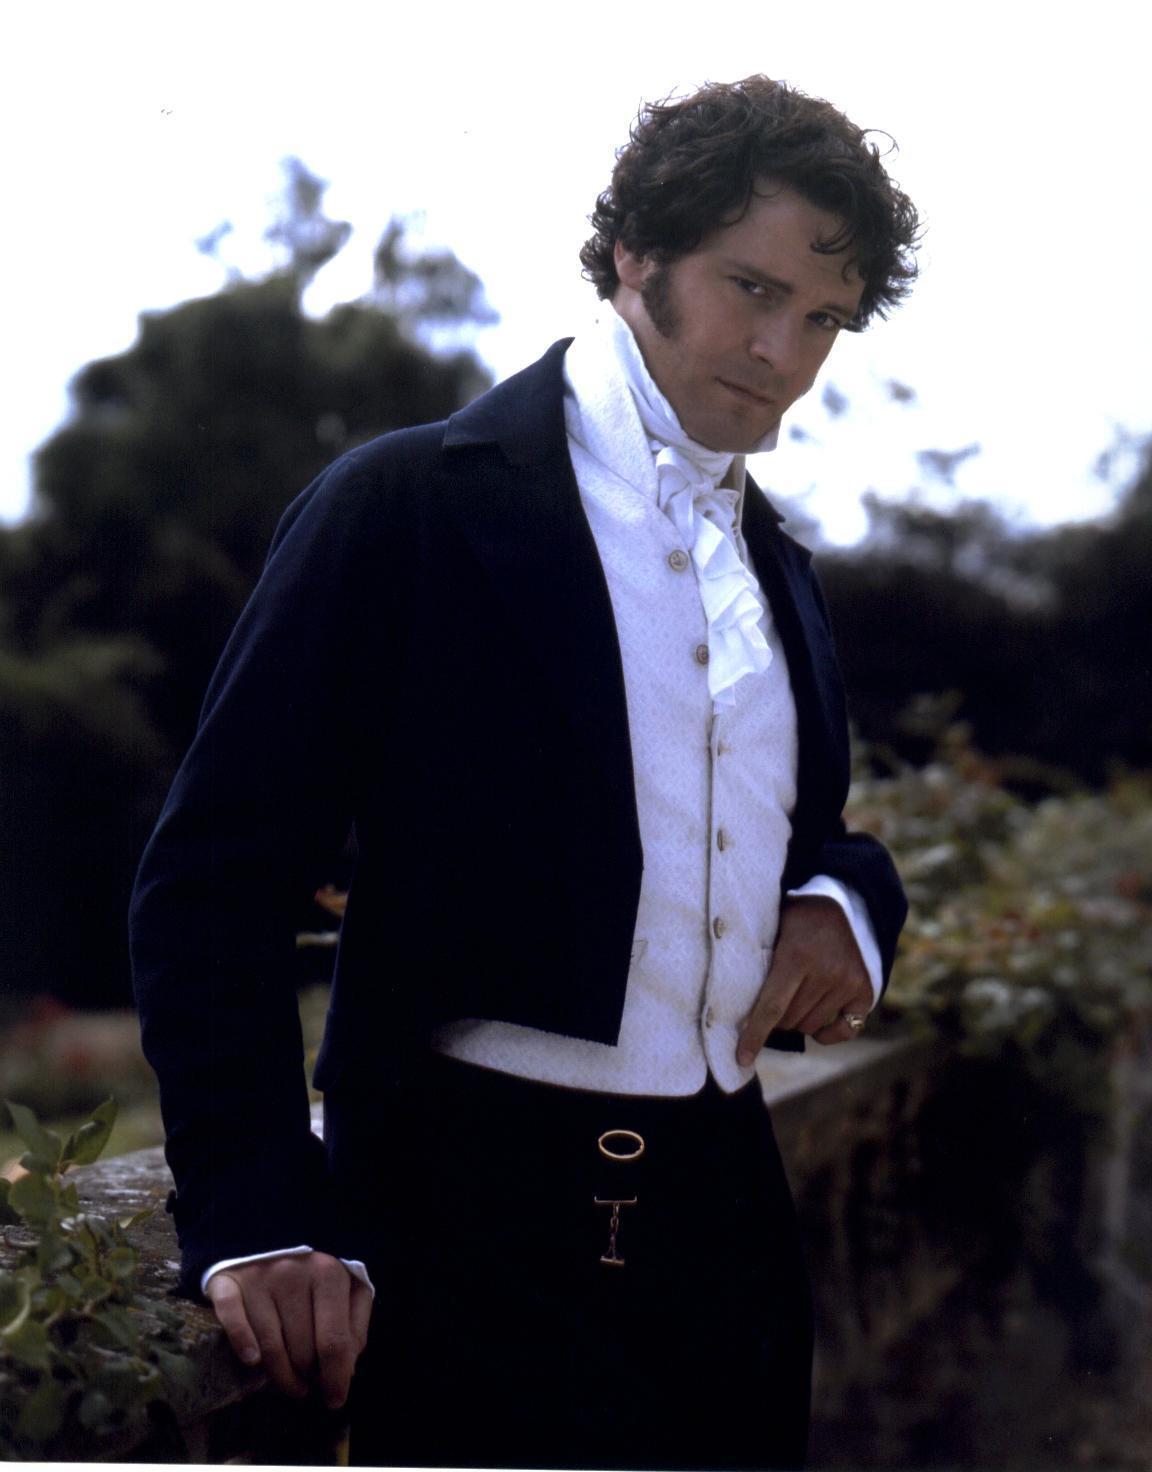 Colin Firth mr Darcy mr Darcy Colin Firth as Darcy